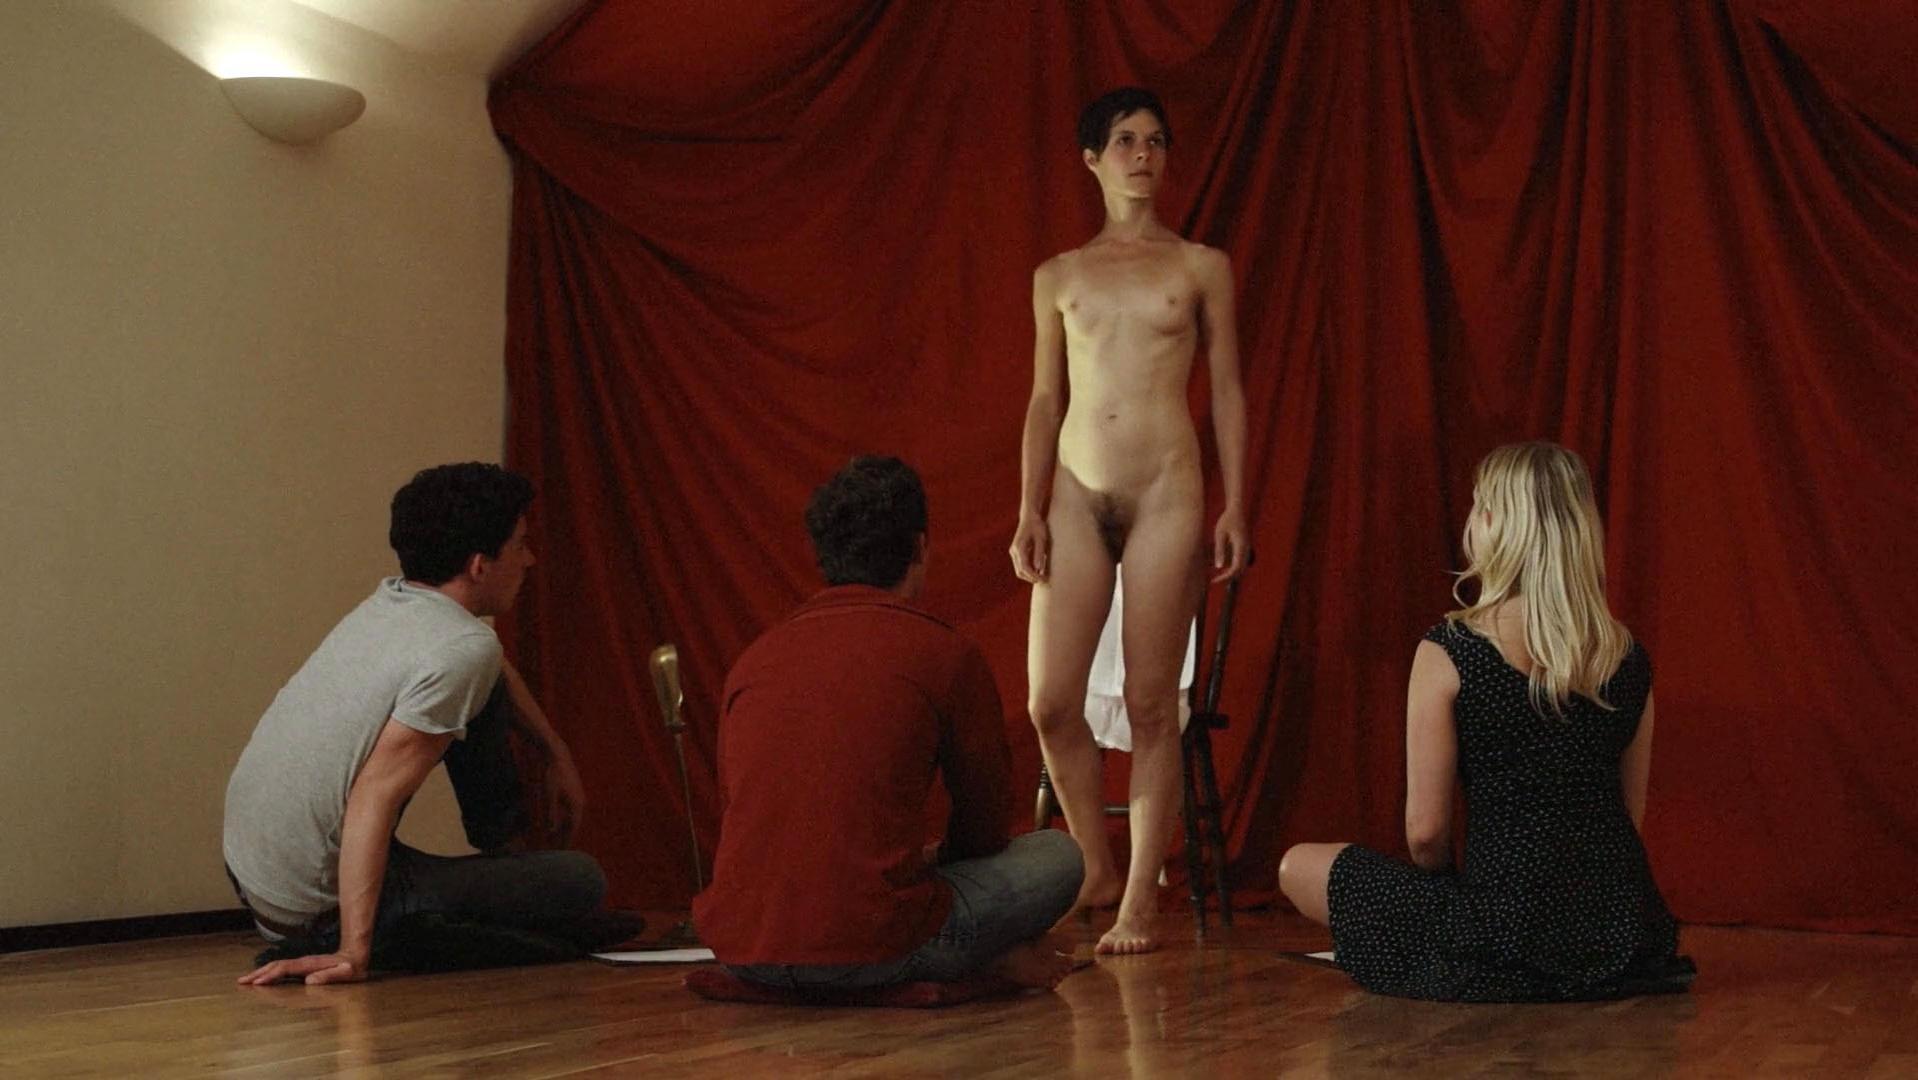 Rea Mole nude - Amorous (2014)